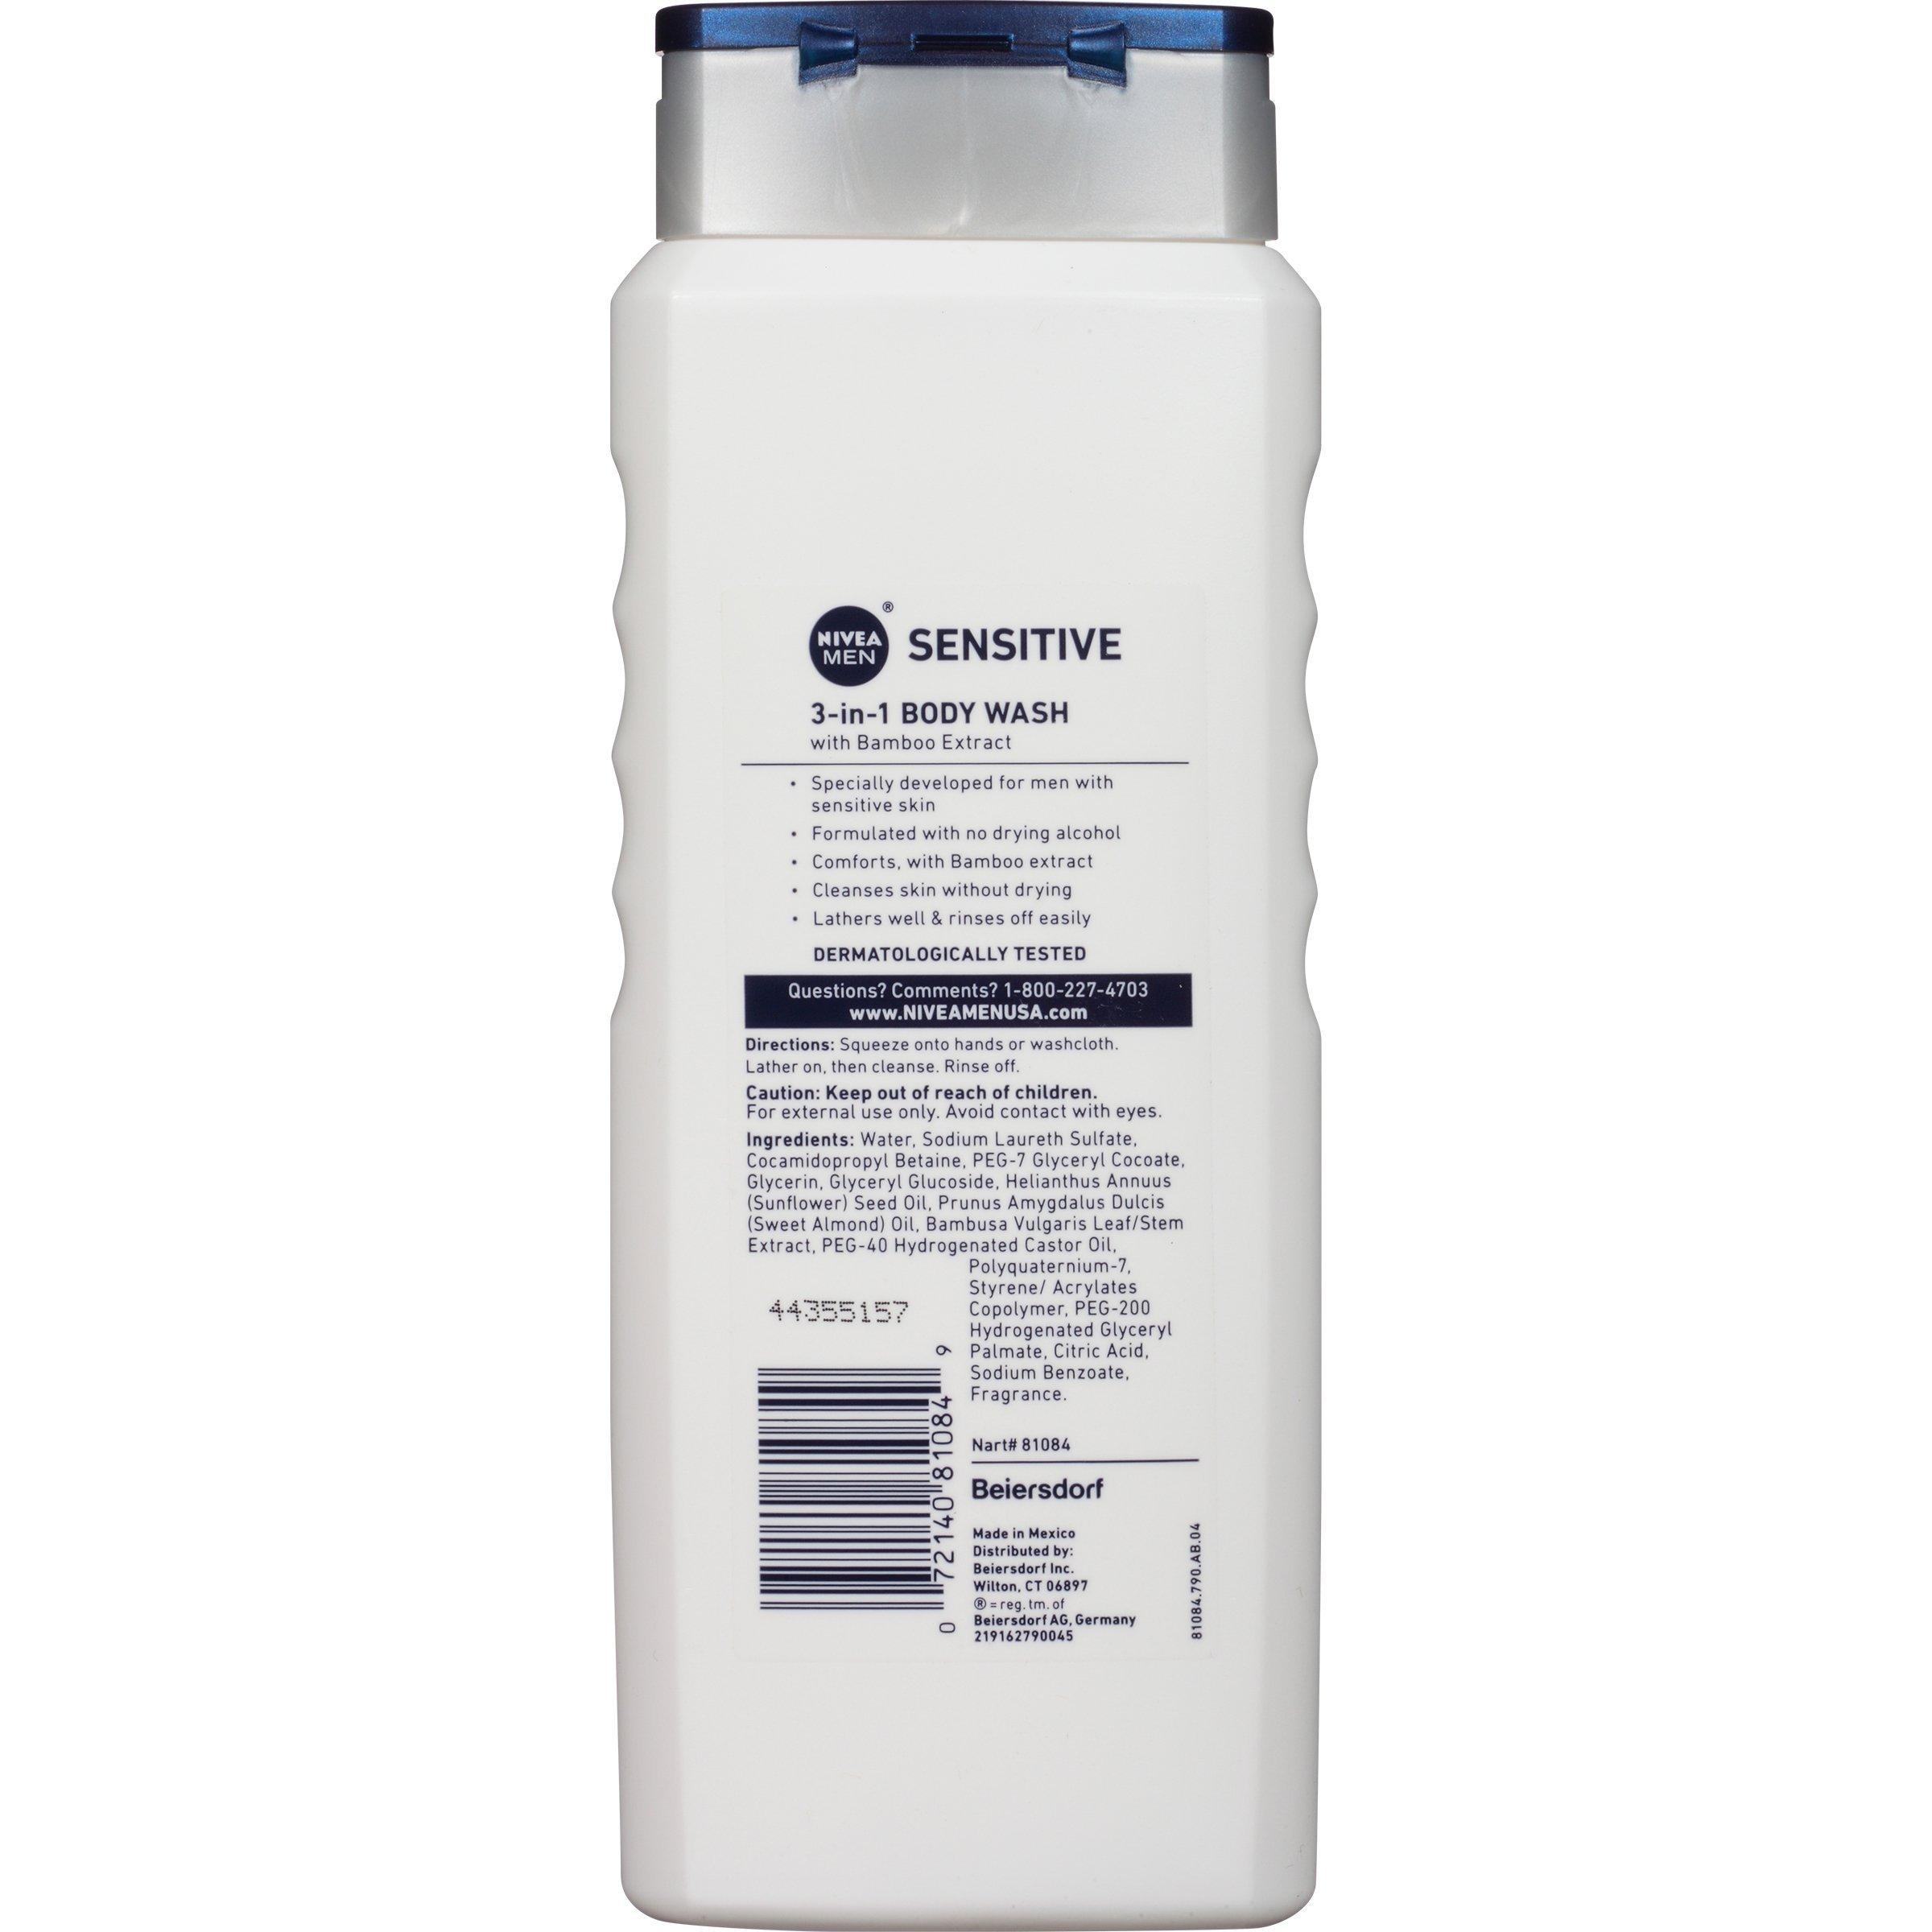 NIVEA Men Sensitive 3-in-1 Body Wash - Shower, Shampoo and Refresh, Soap and Dye-Free For Sensitive Skin - 16.9 fl. oz. (Pack of 3) by Nivea Men (Image #4)